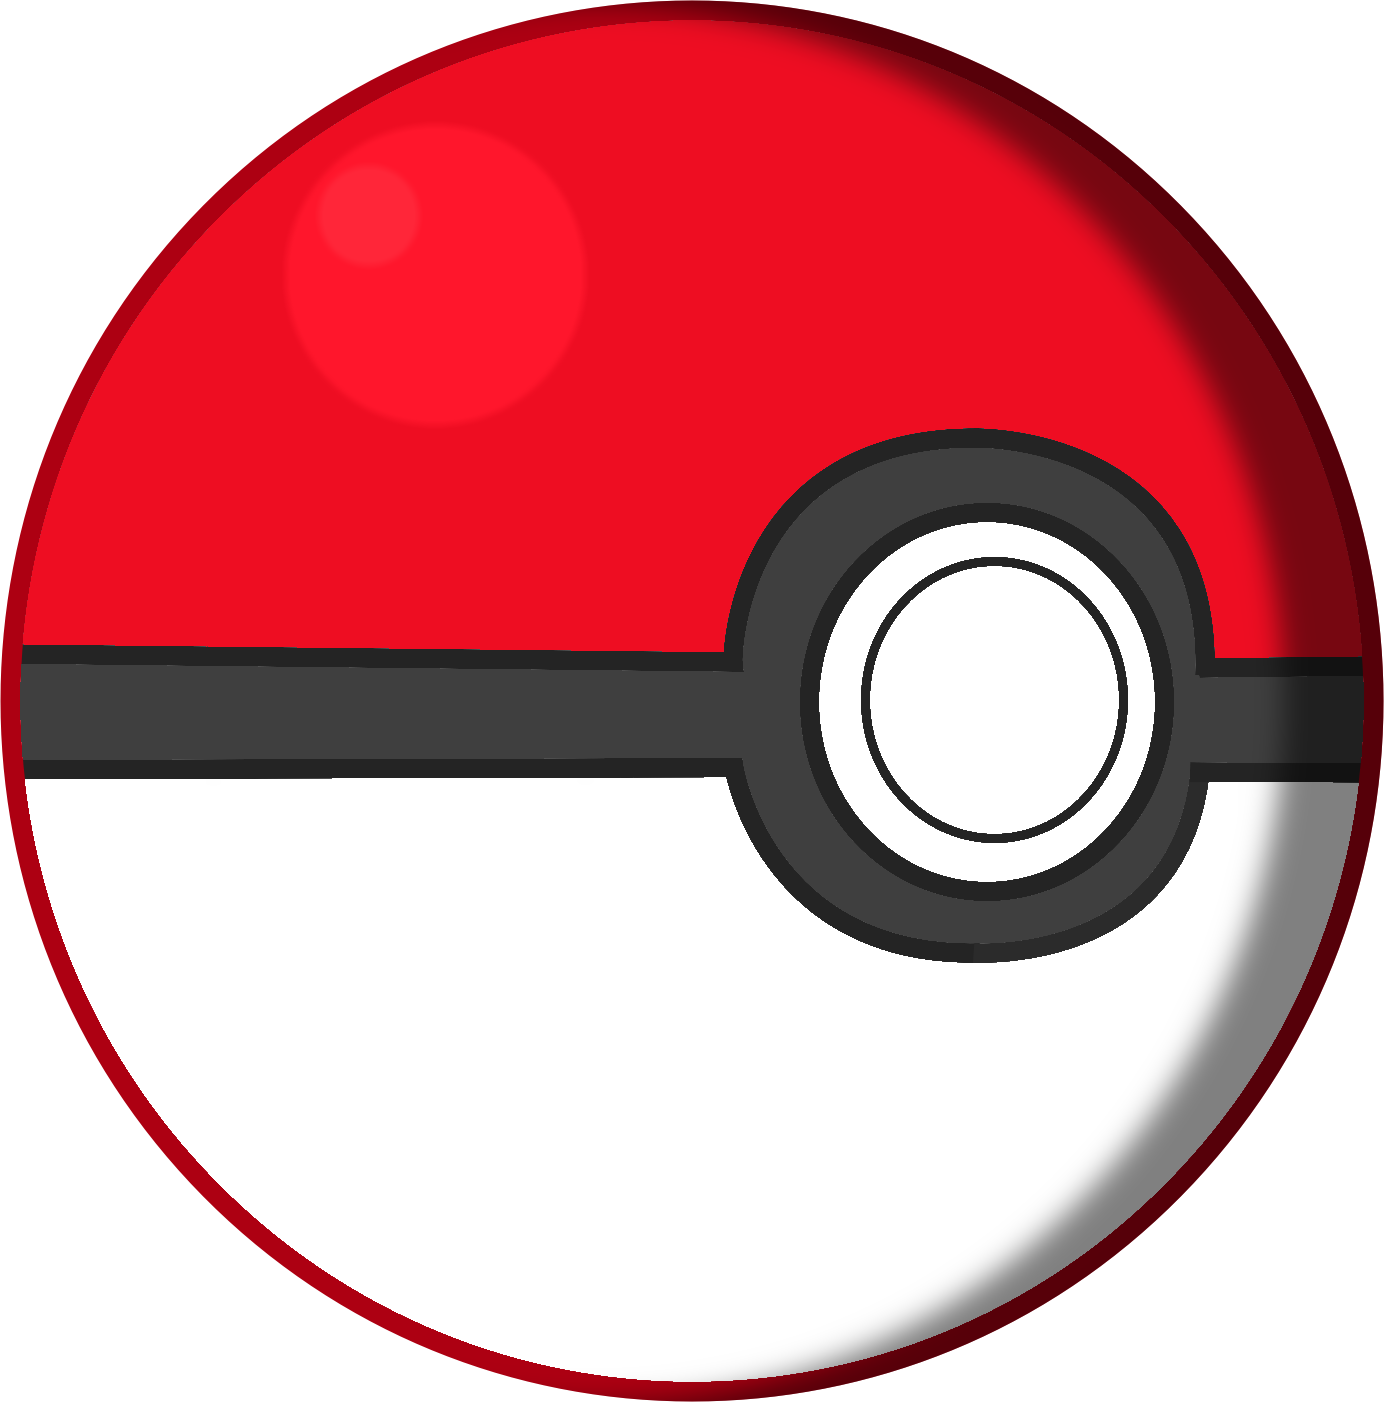 Pokemon ball png images. Pokeball clipart gambar